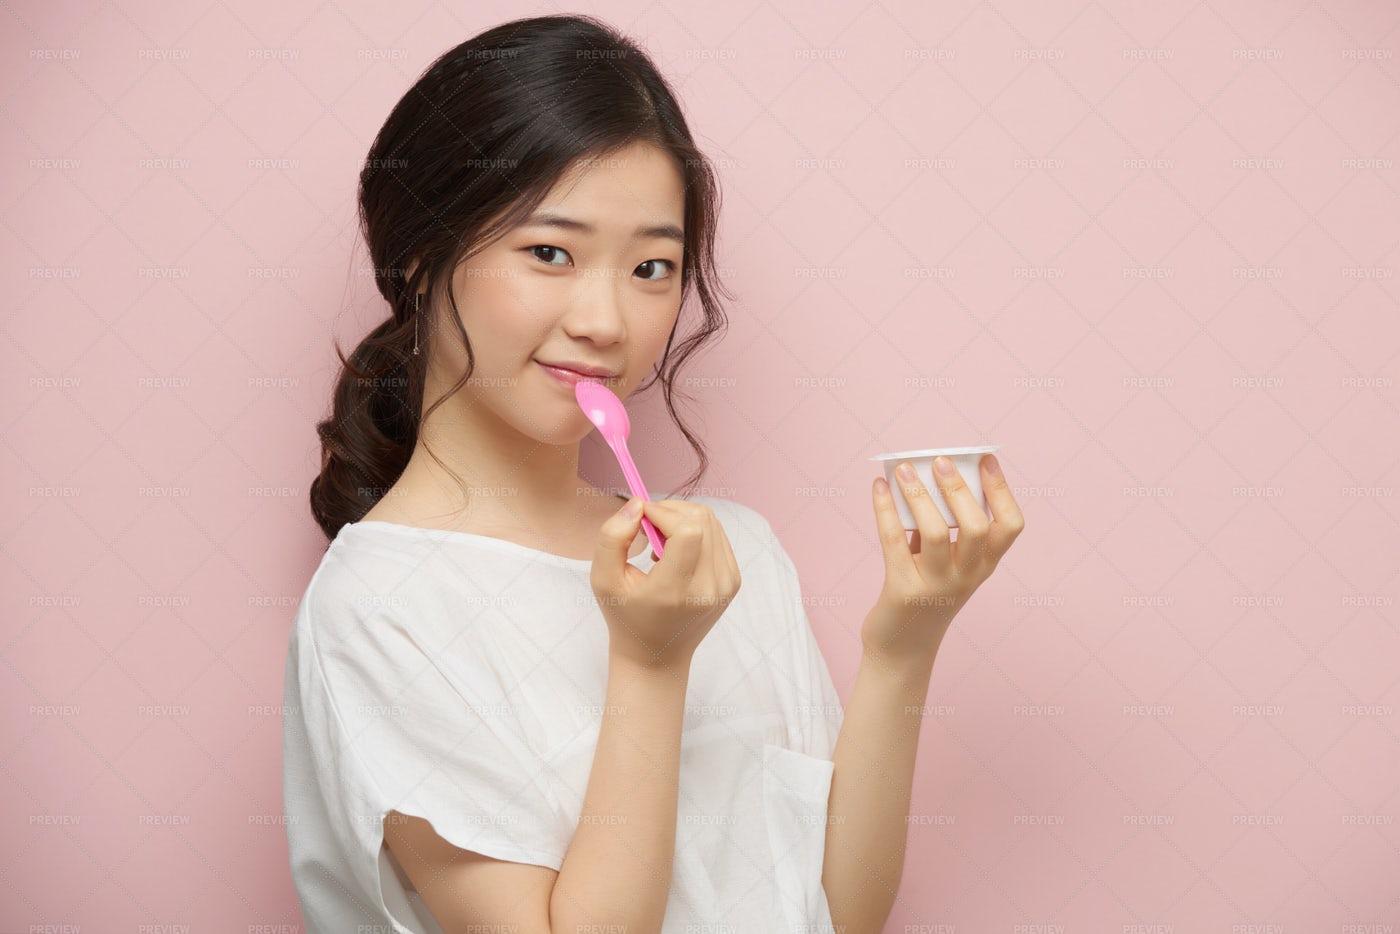 Eating Yogurt: Stock Photos